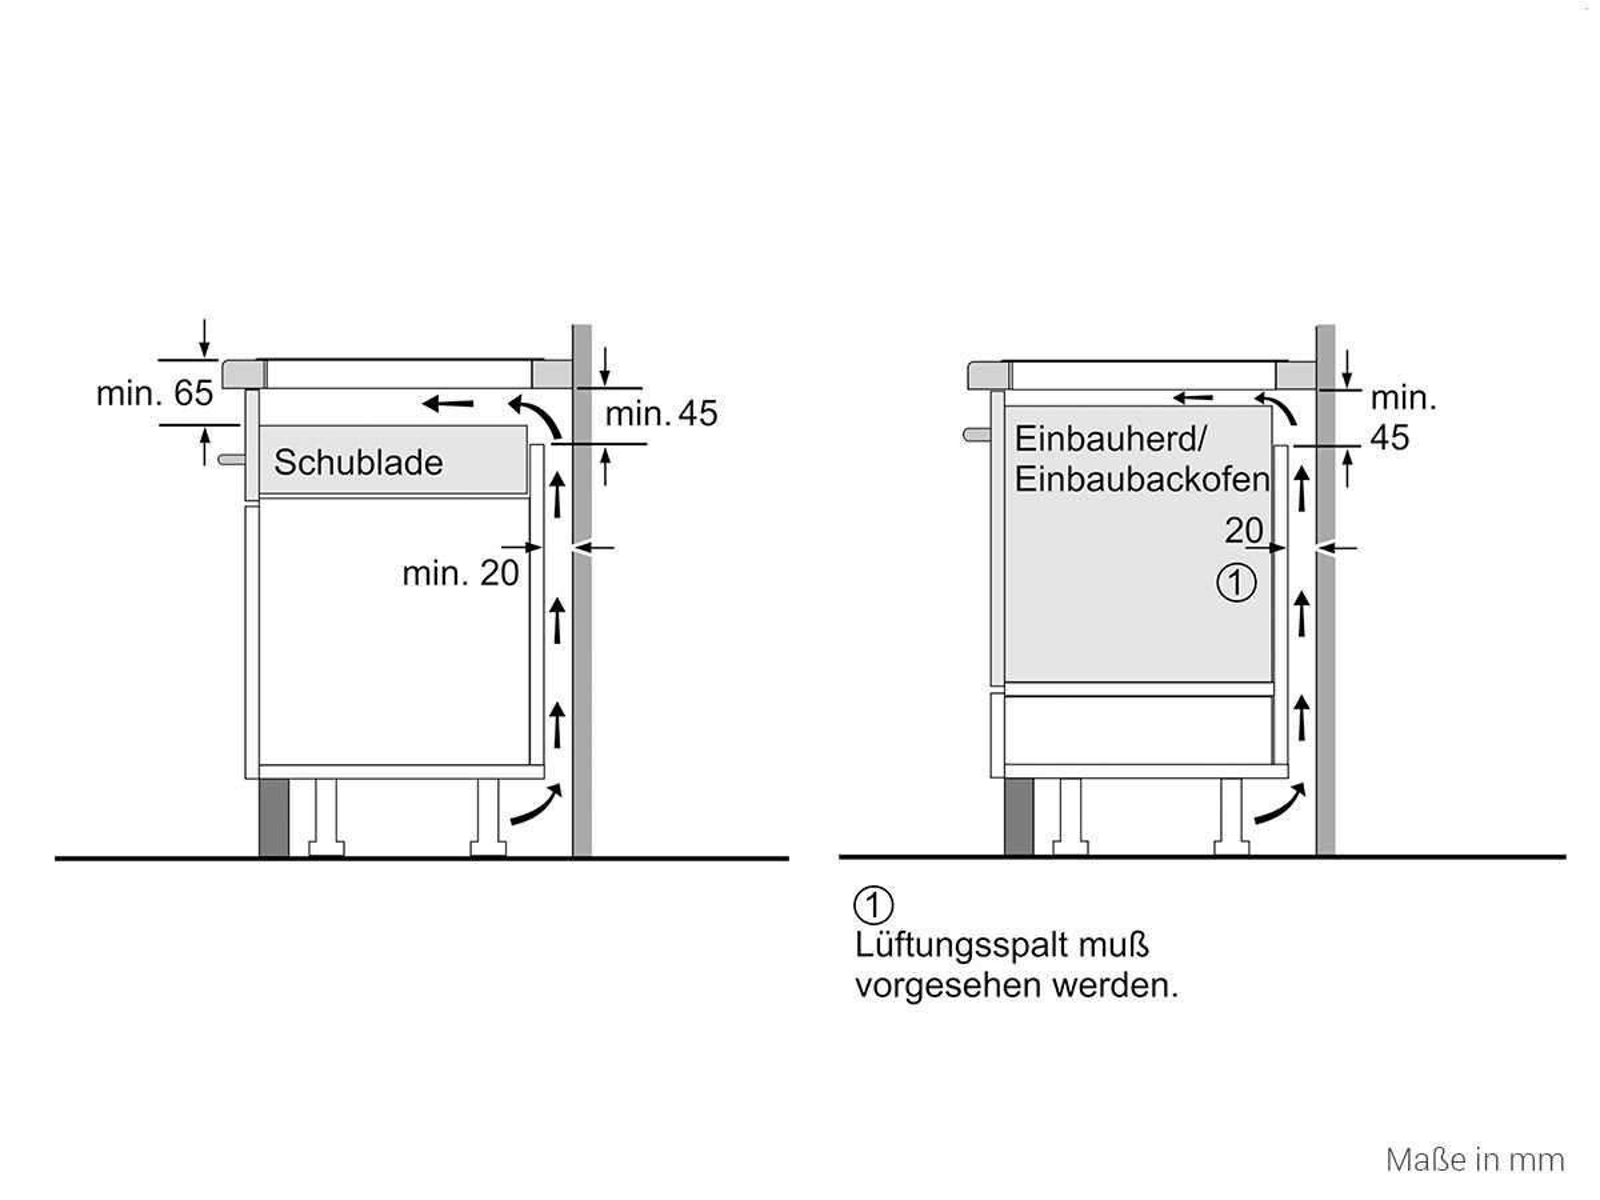 siemens ex675jyw1e induktionskochfeld autark. Black Bedroom Furniture Sets. Home Design Ideas